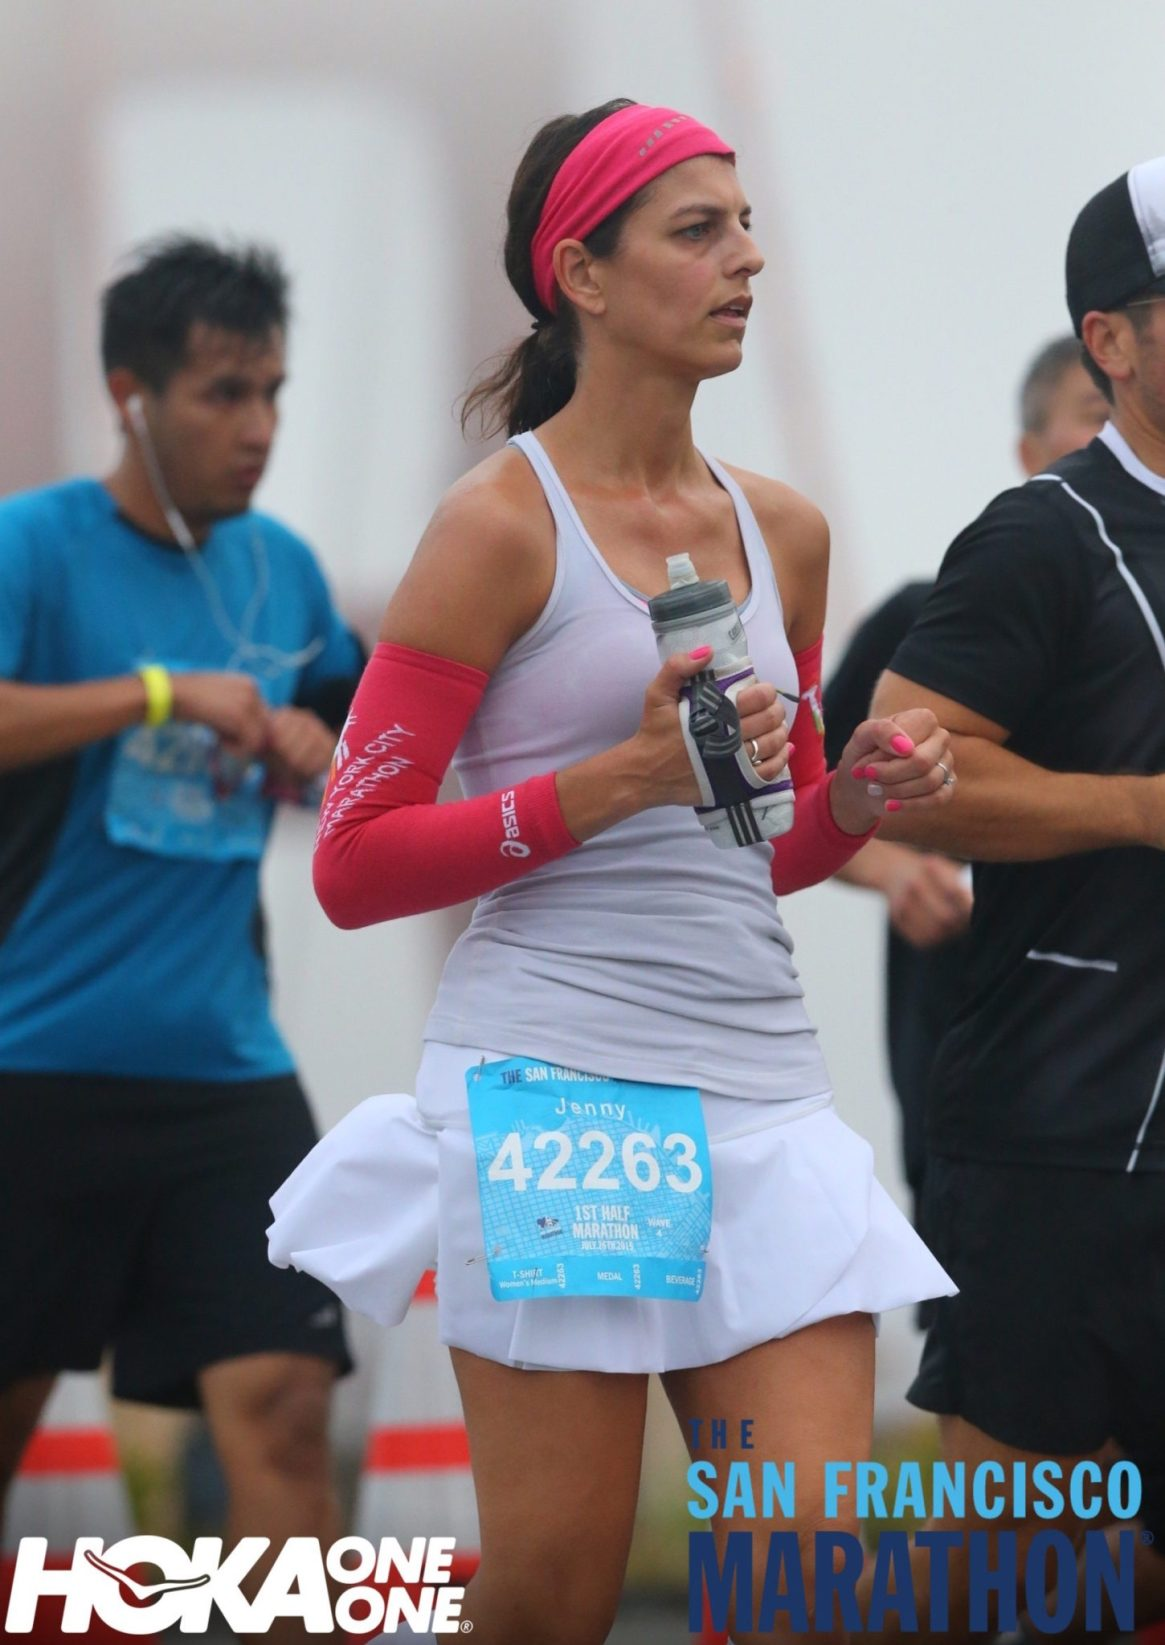 SF Marathon, Golden Gate Bridge, 1st Half Marathon, Lululemon, Buff USA